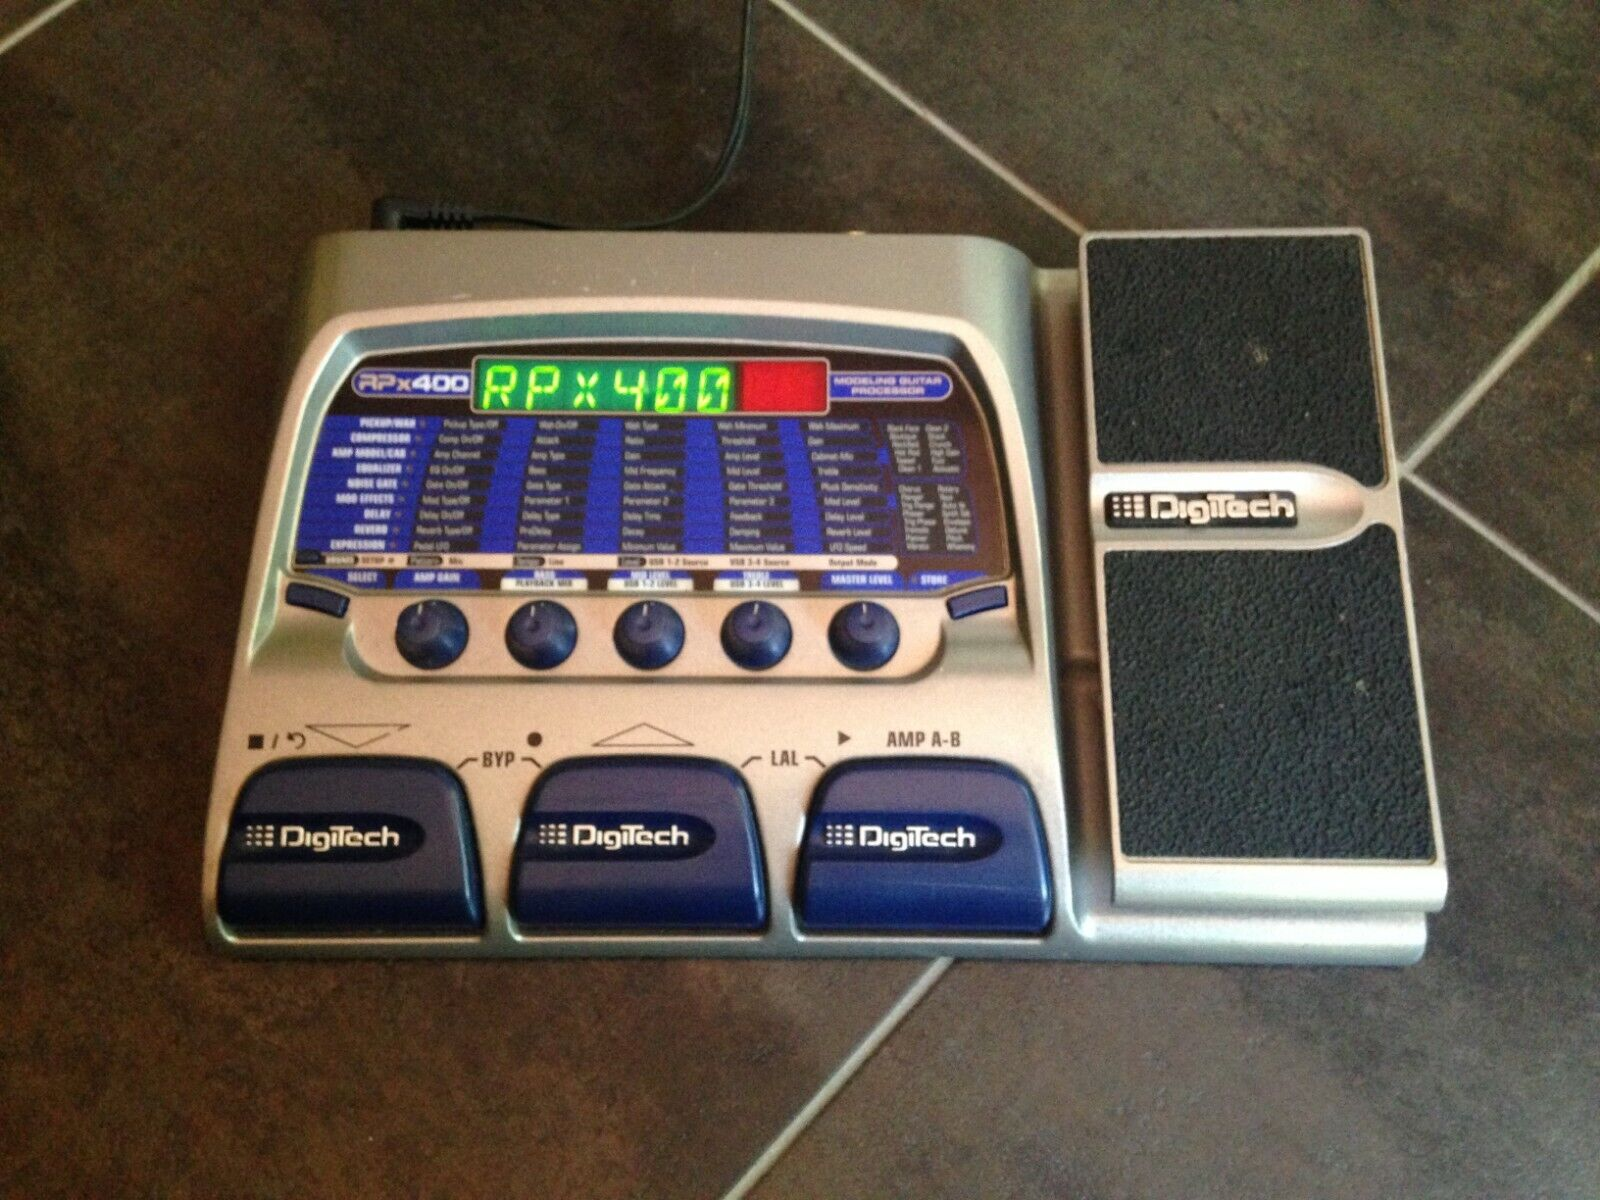 Digitech Rpx400 - Multi-Effects Modeling Guitar Processor by Harman Music Group